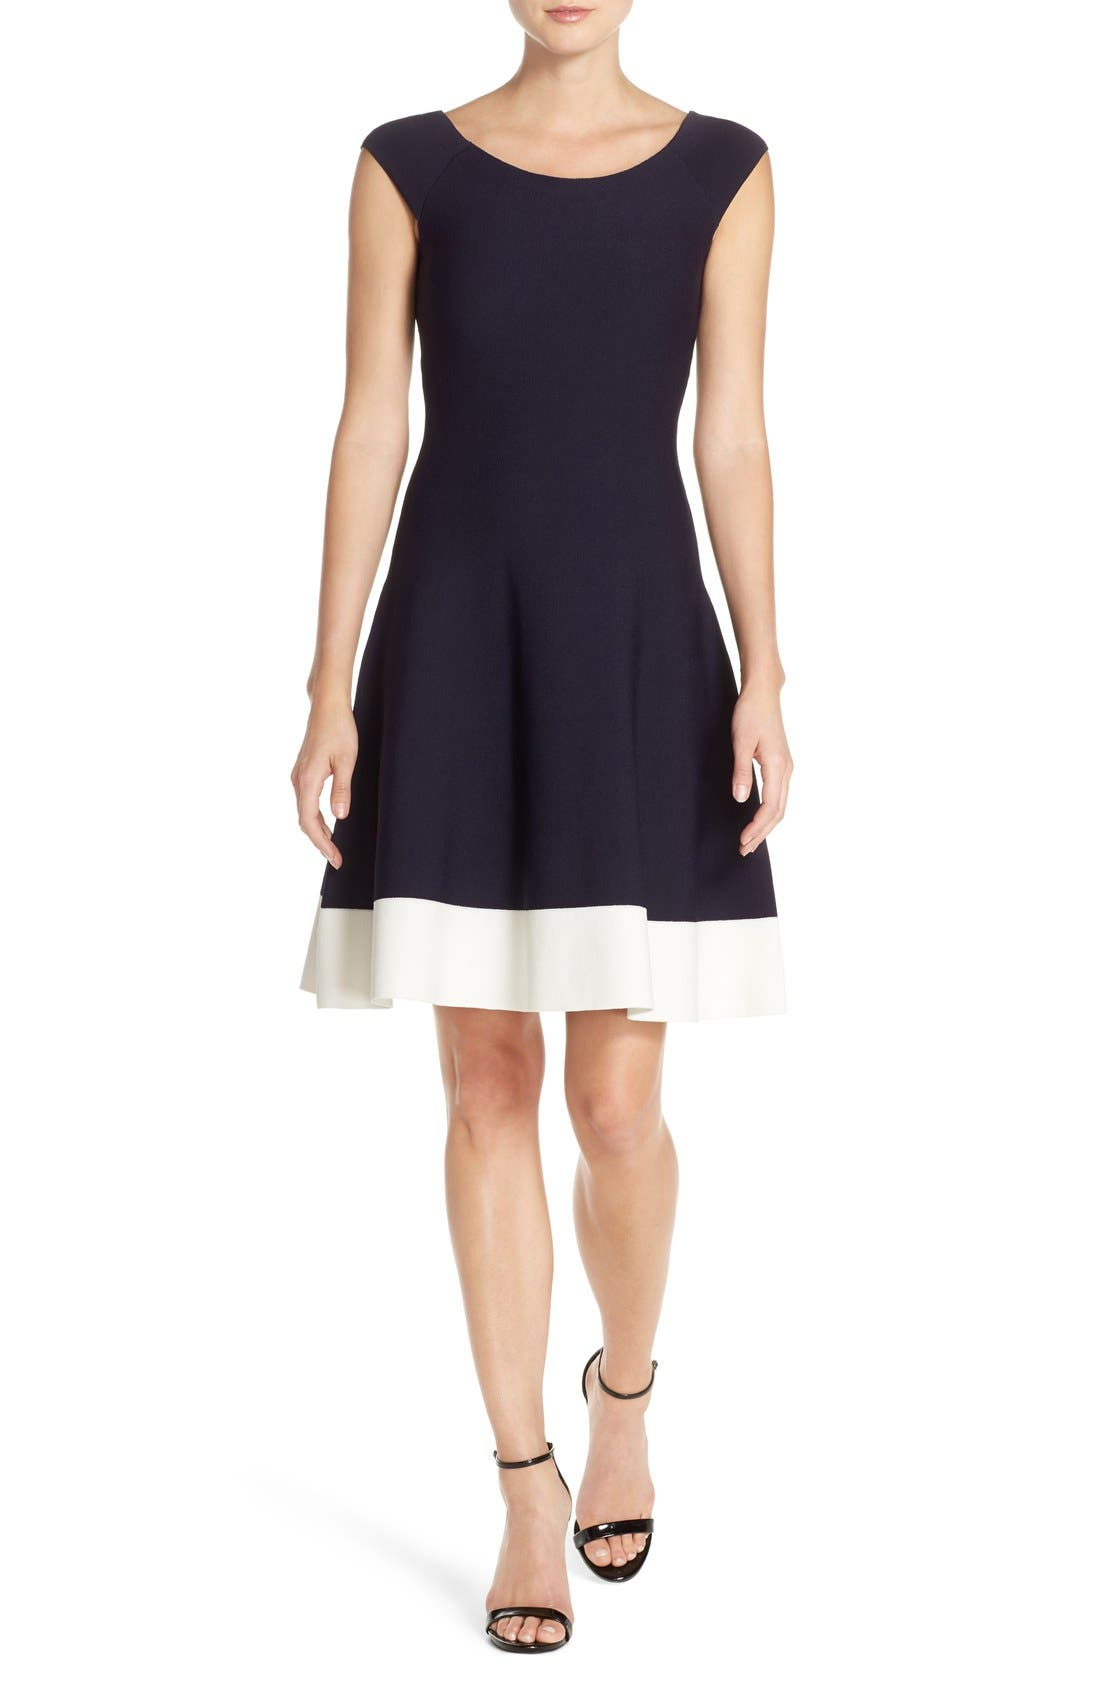 Alternate Image 1 Selected - Eliza J Colorblock Fit & Flare Sweater Dress (Regular & Petite)